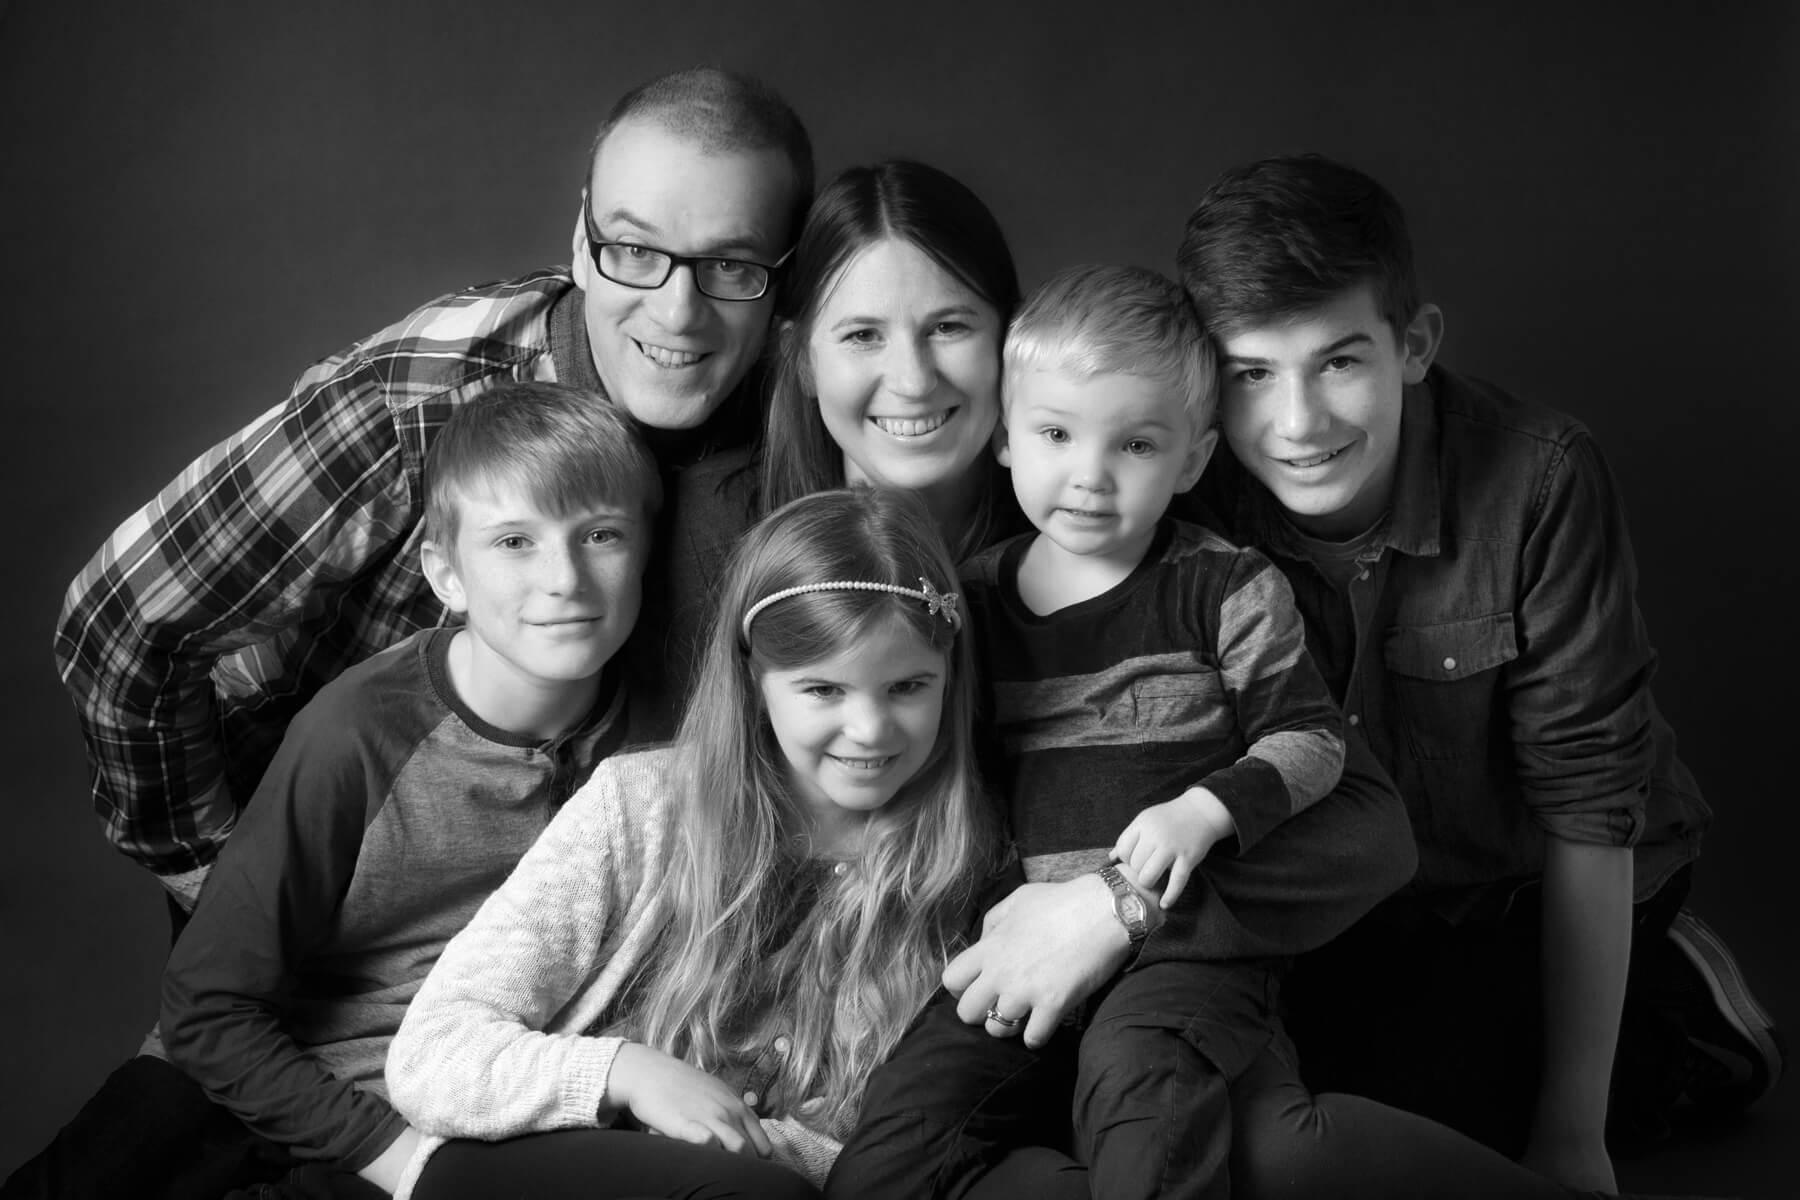 Edinburgh family photography